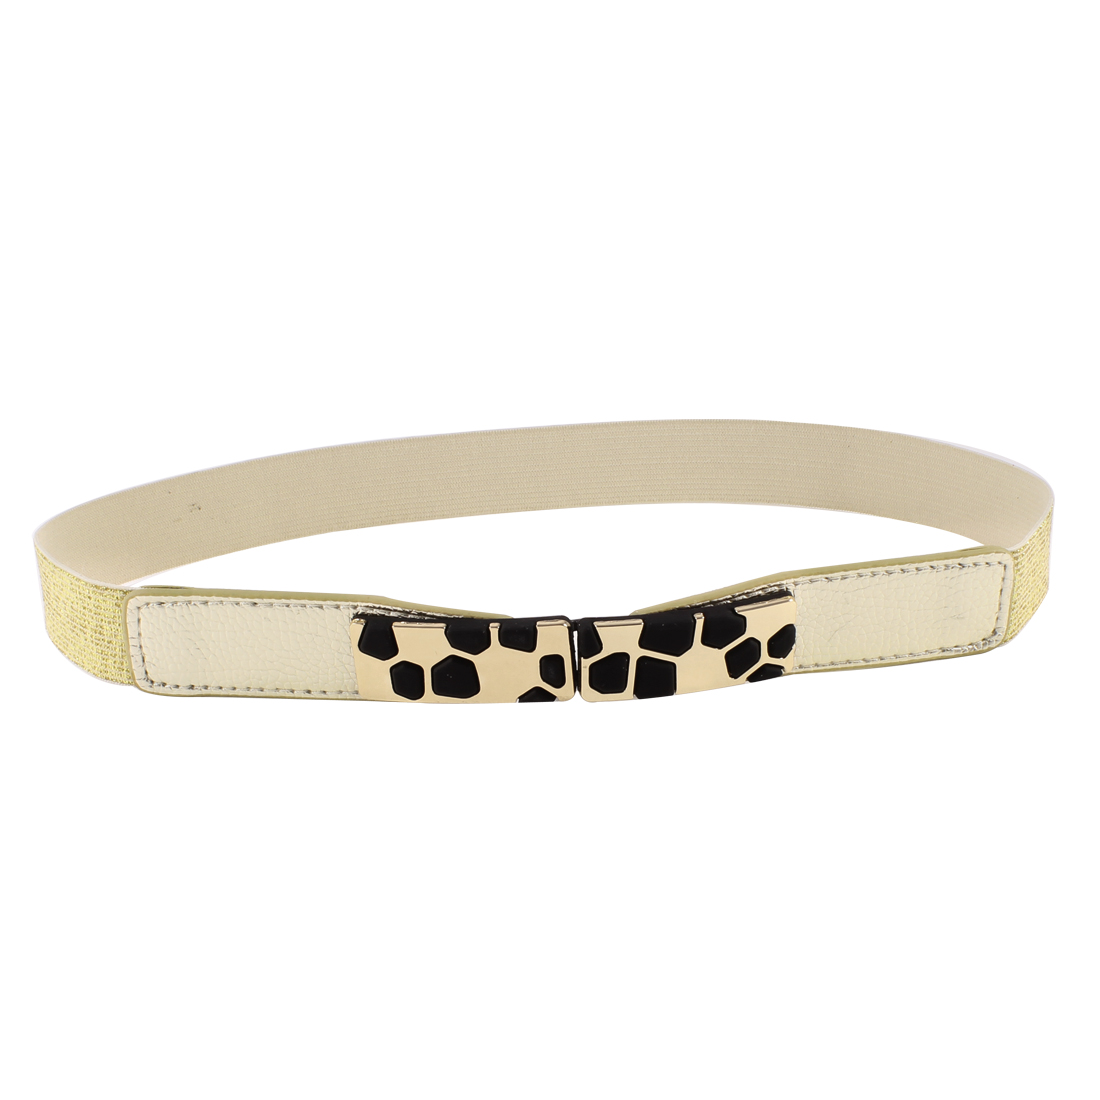 Block Design Metal Interlocking Buckle Stretchy Waist Belt Gold Tone for Ladies